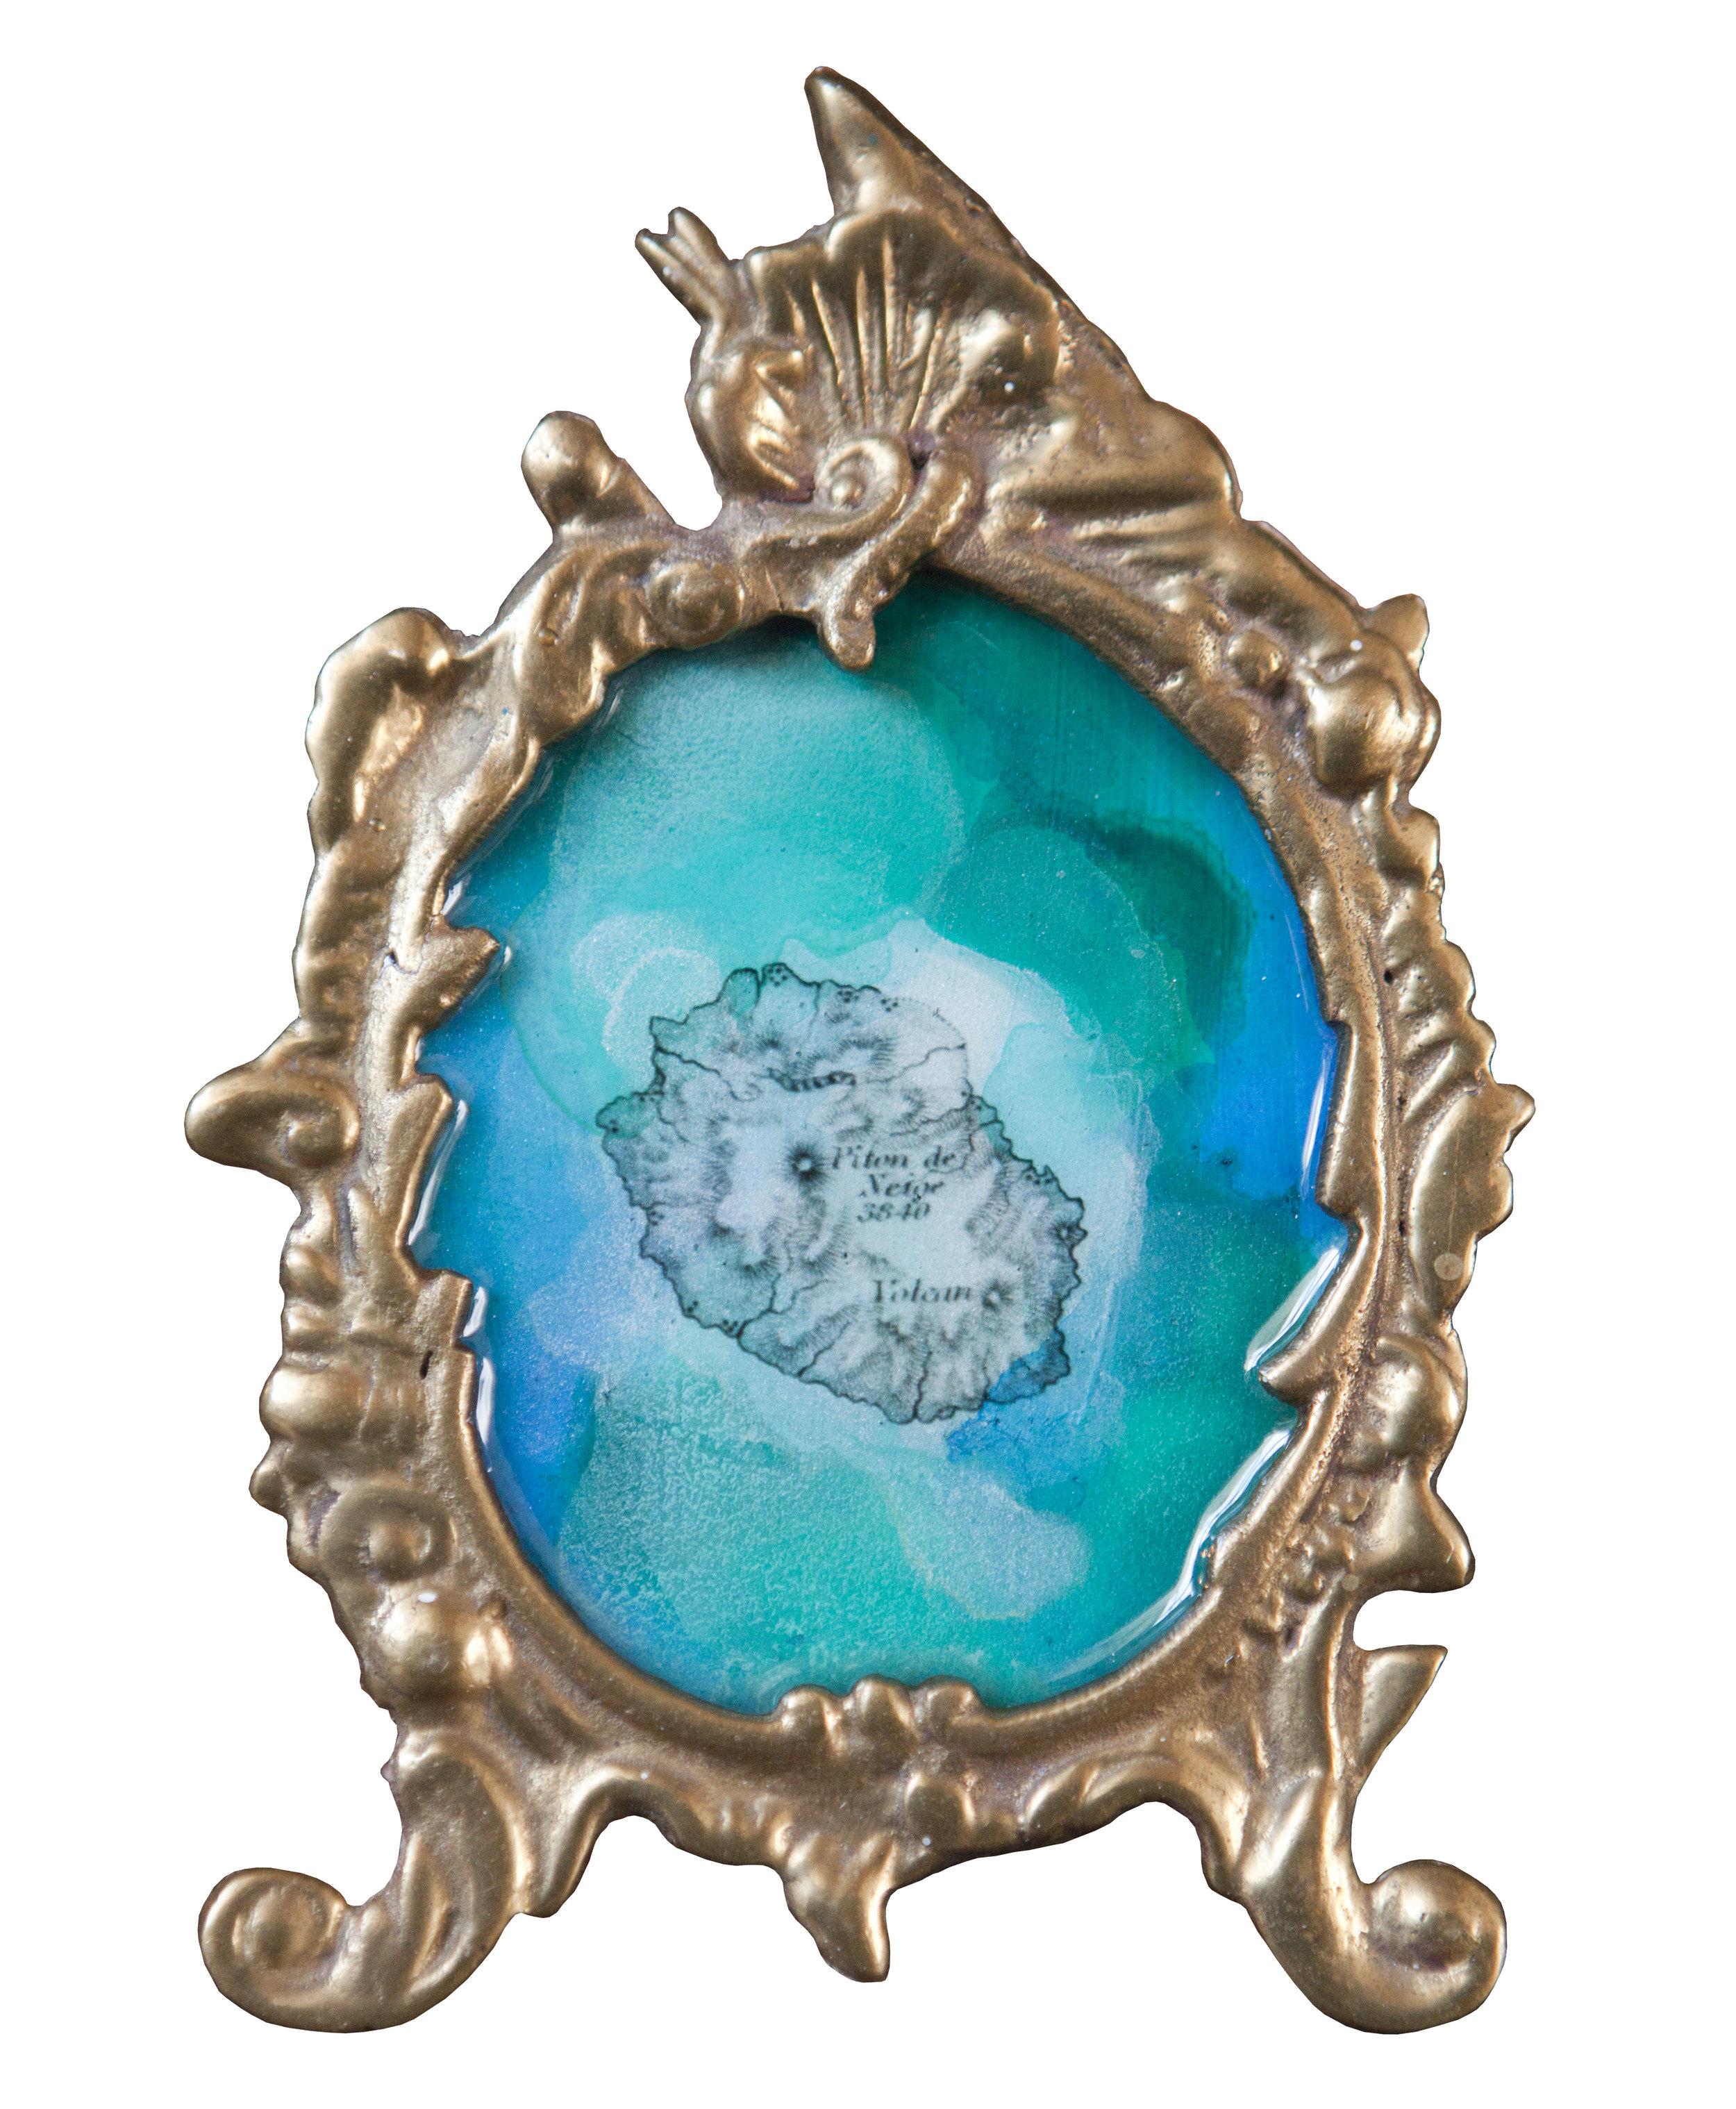 Shiraz Bayjoo    Ma Coeur 2    Acrylic on board, resin, metal  16.5 x 10.5 x 7 cm  2017